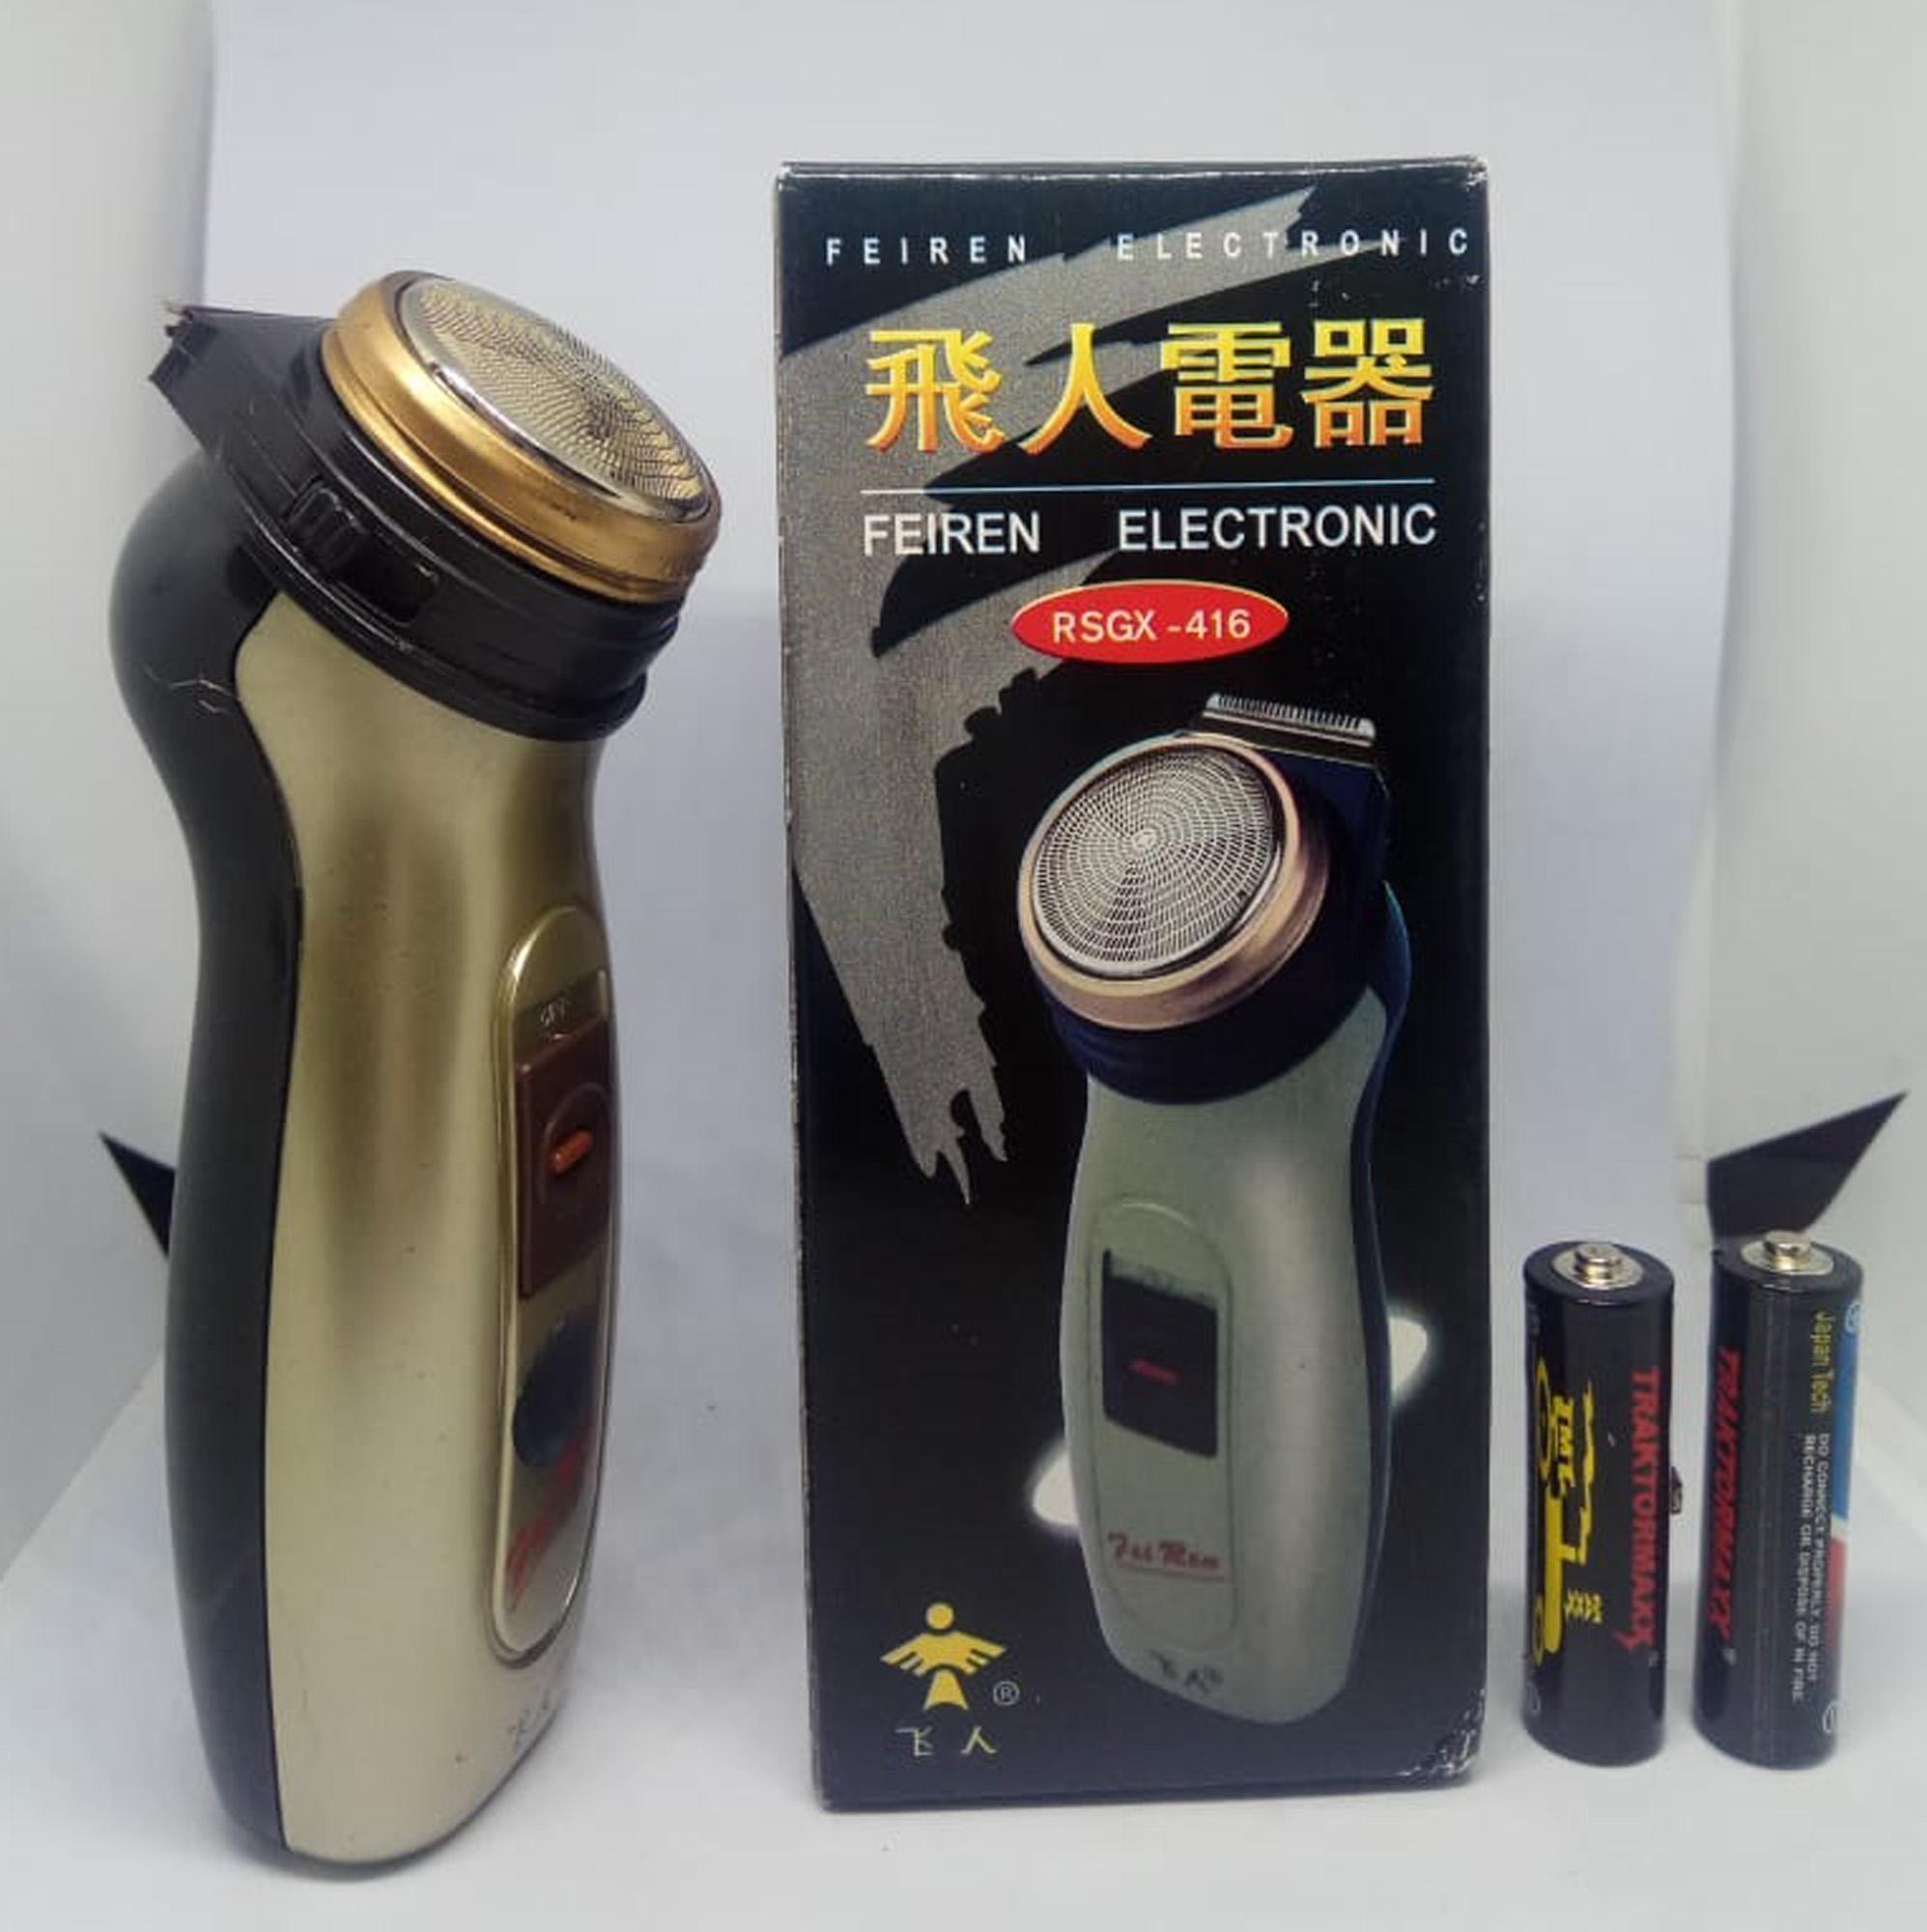 Alat Cukur Jenggot dan Kumis Feiren Retro Style FREE 2 Pcs Baterai REAL PICTURE - 2 ...